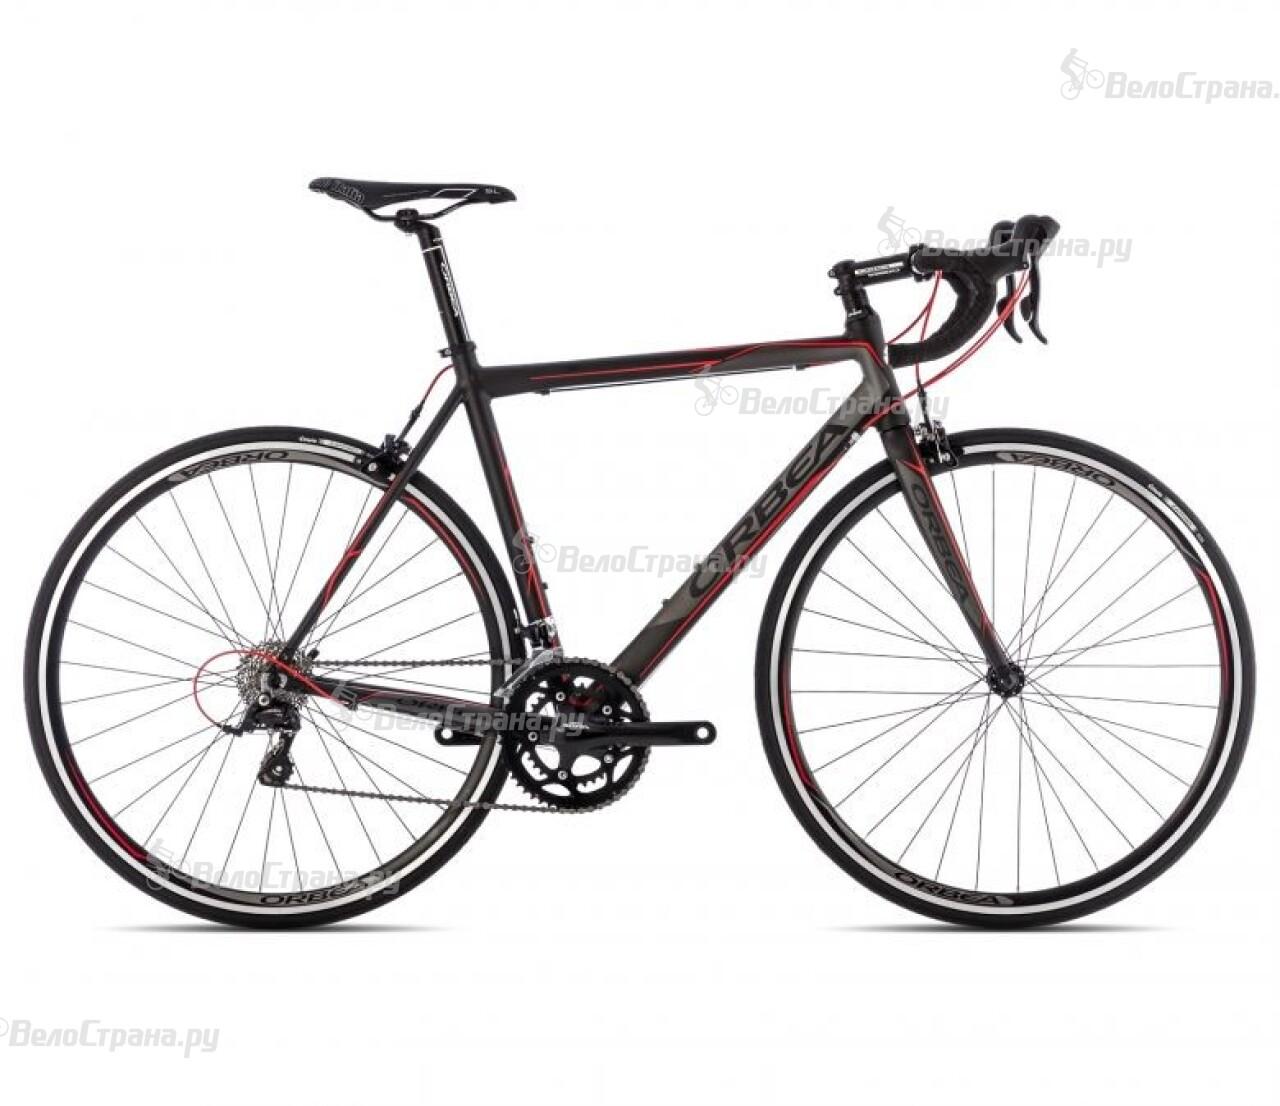 Велосипед Orbea Aqua 30 (2014) велосипед orbea aqua t23 2013